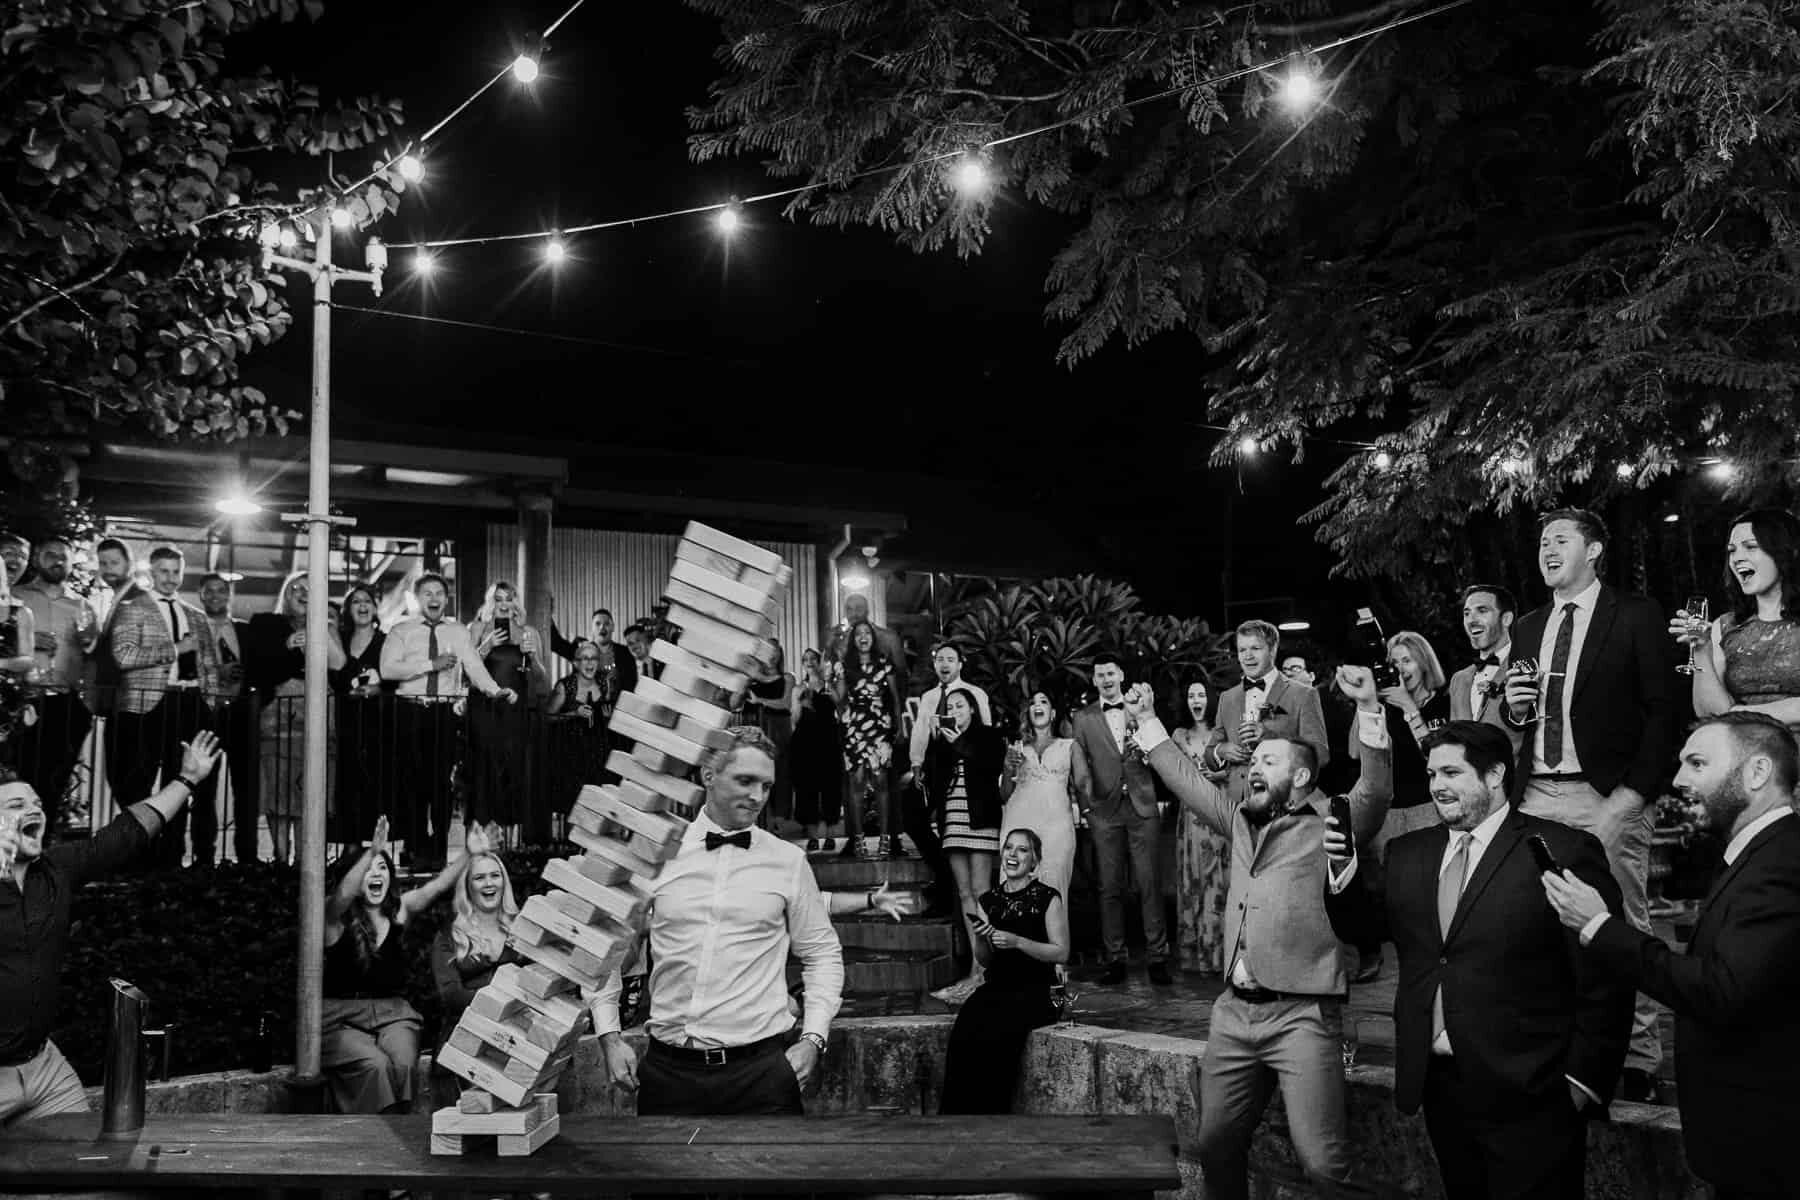 journalistic Perth wedding photographer, Adam Levi Browne